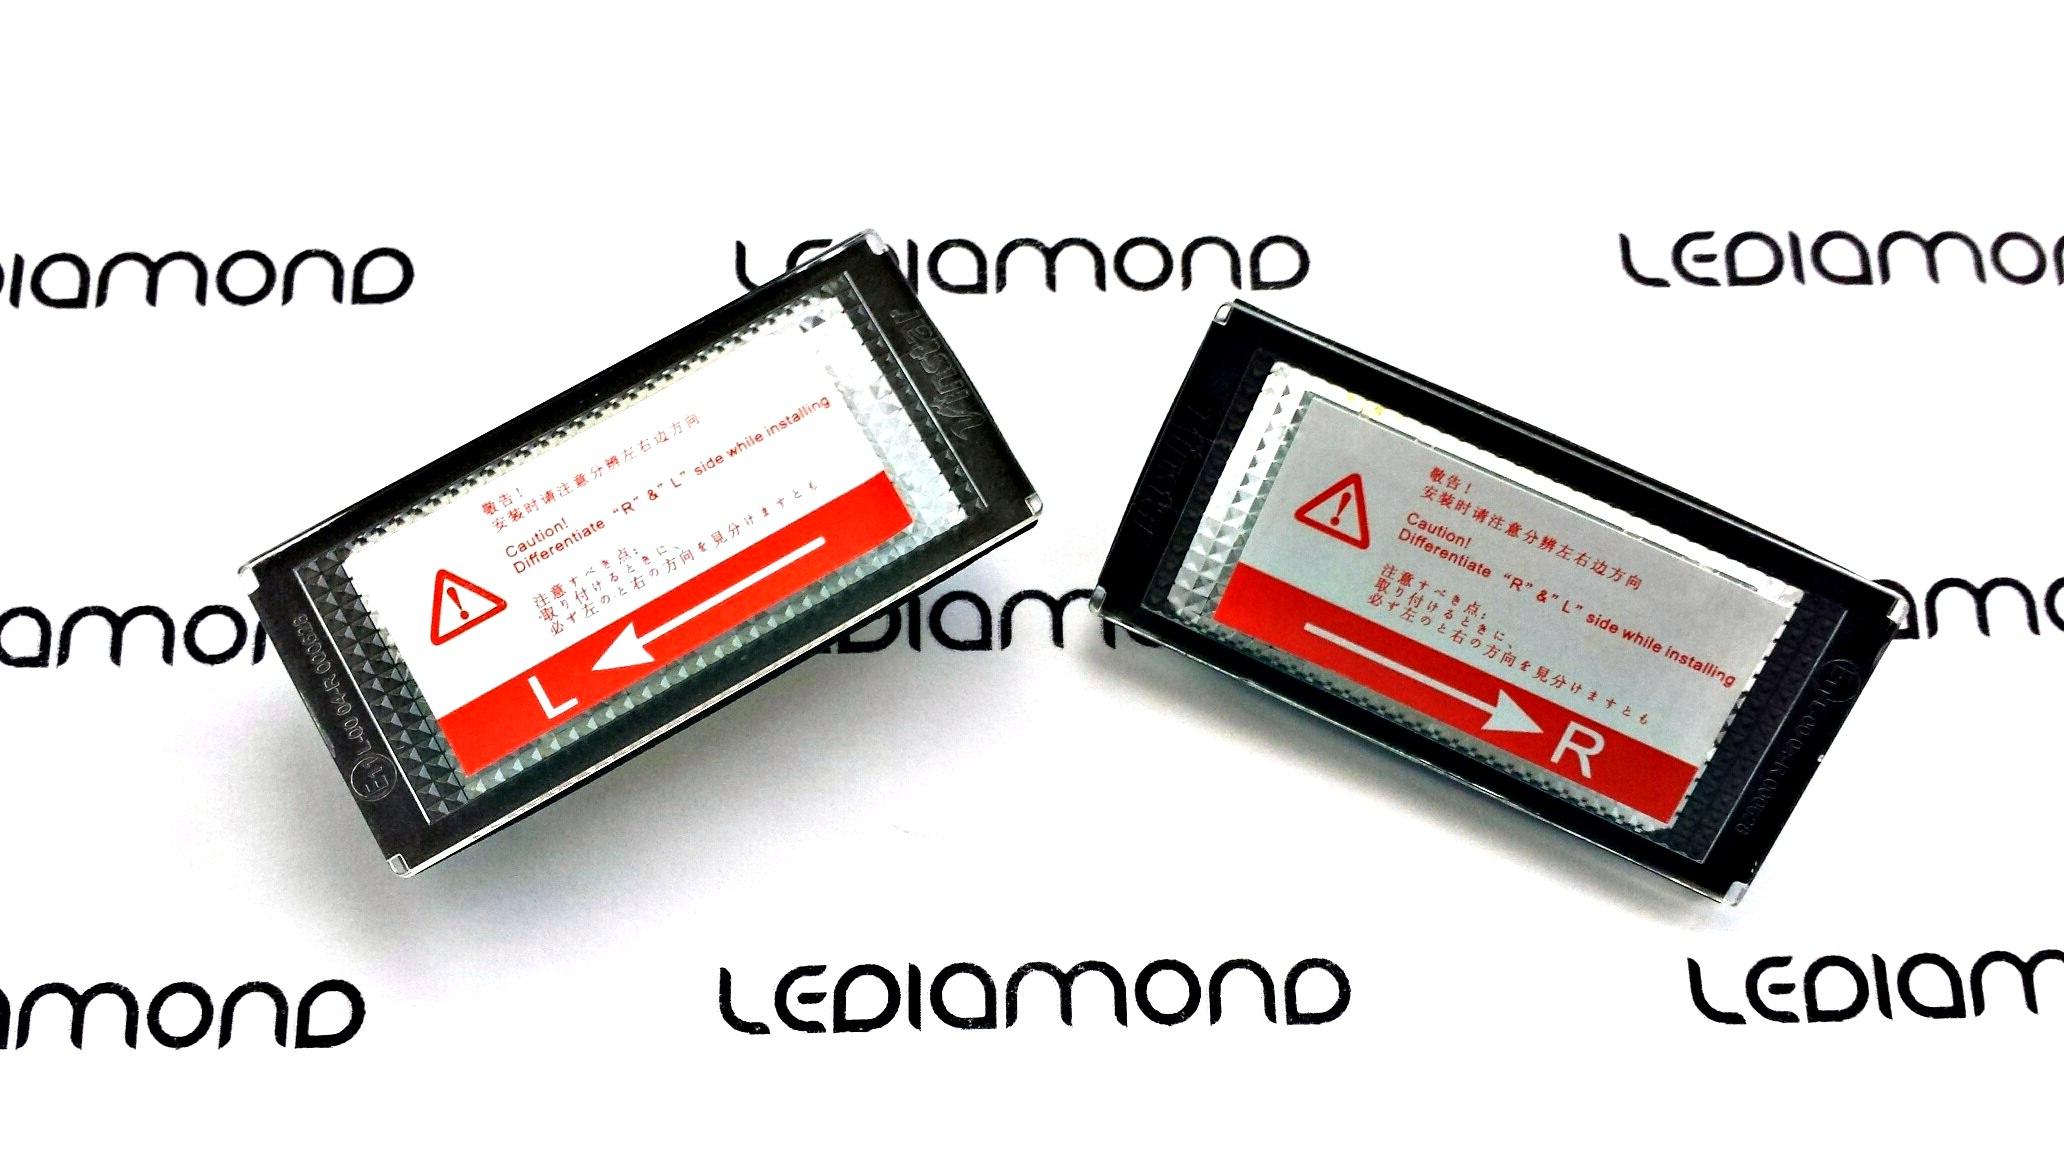 PLAFONES MATRICULA LED BMW E46 COUPE 2D y M3 LEDIAMOND LMD030101 B